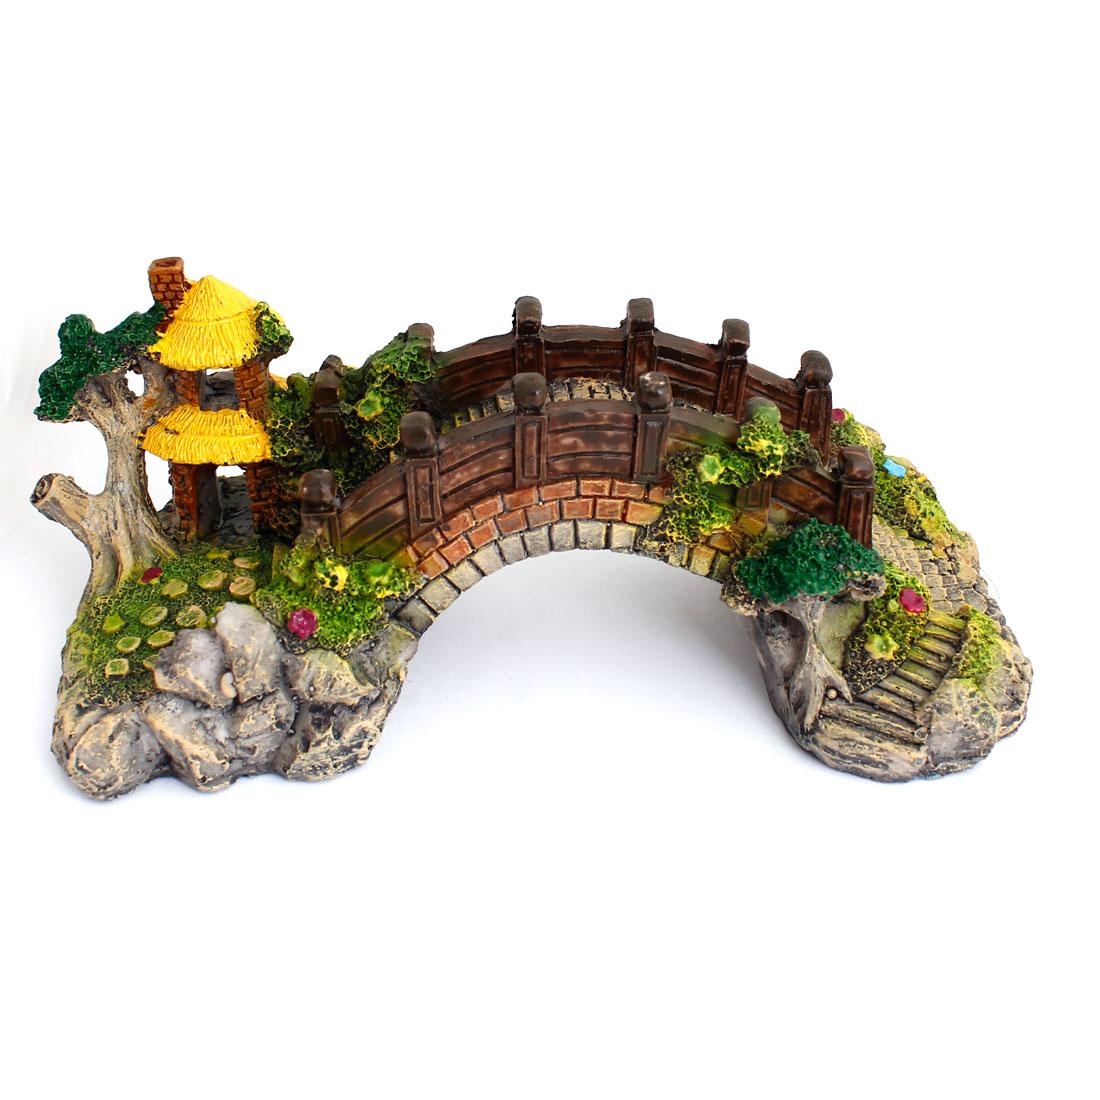 Fish Tank Underwater Resin Decor Colorful Arch Bridge Shaped Ornament Mountain